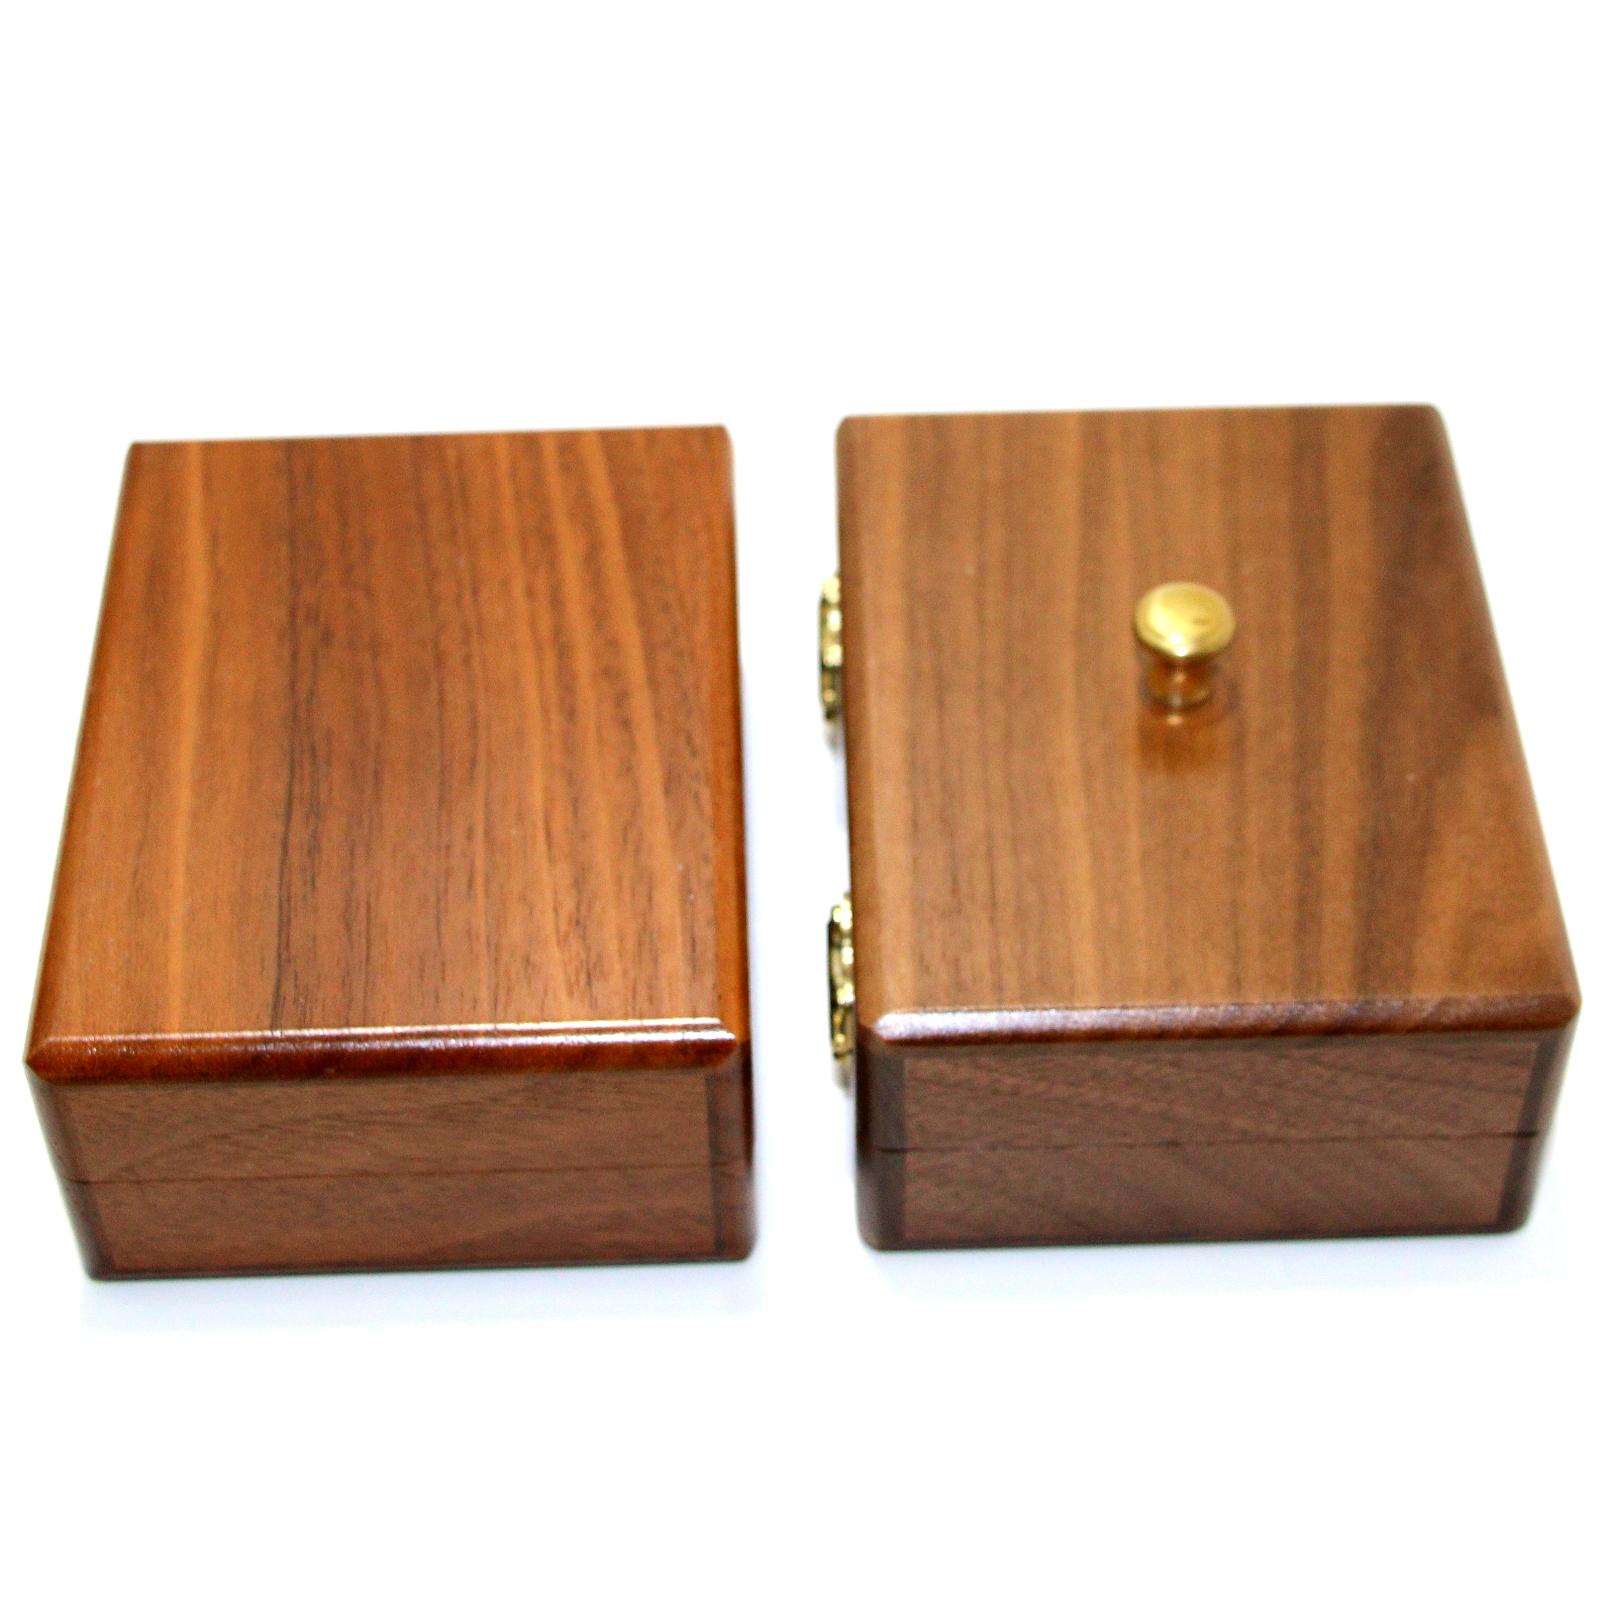 Card Box - Euro Design by Viking Mfg.